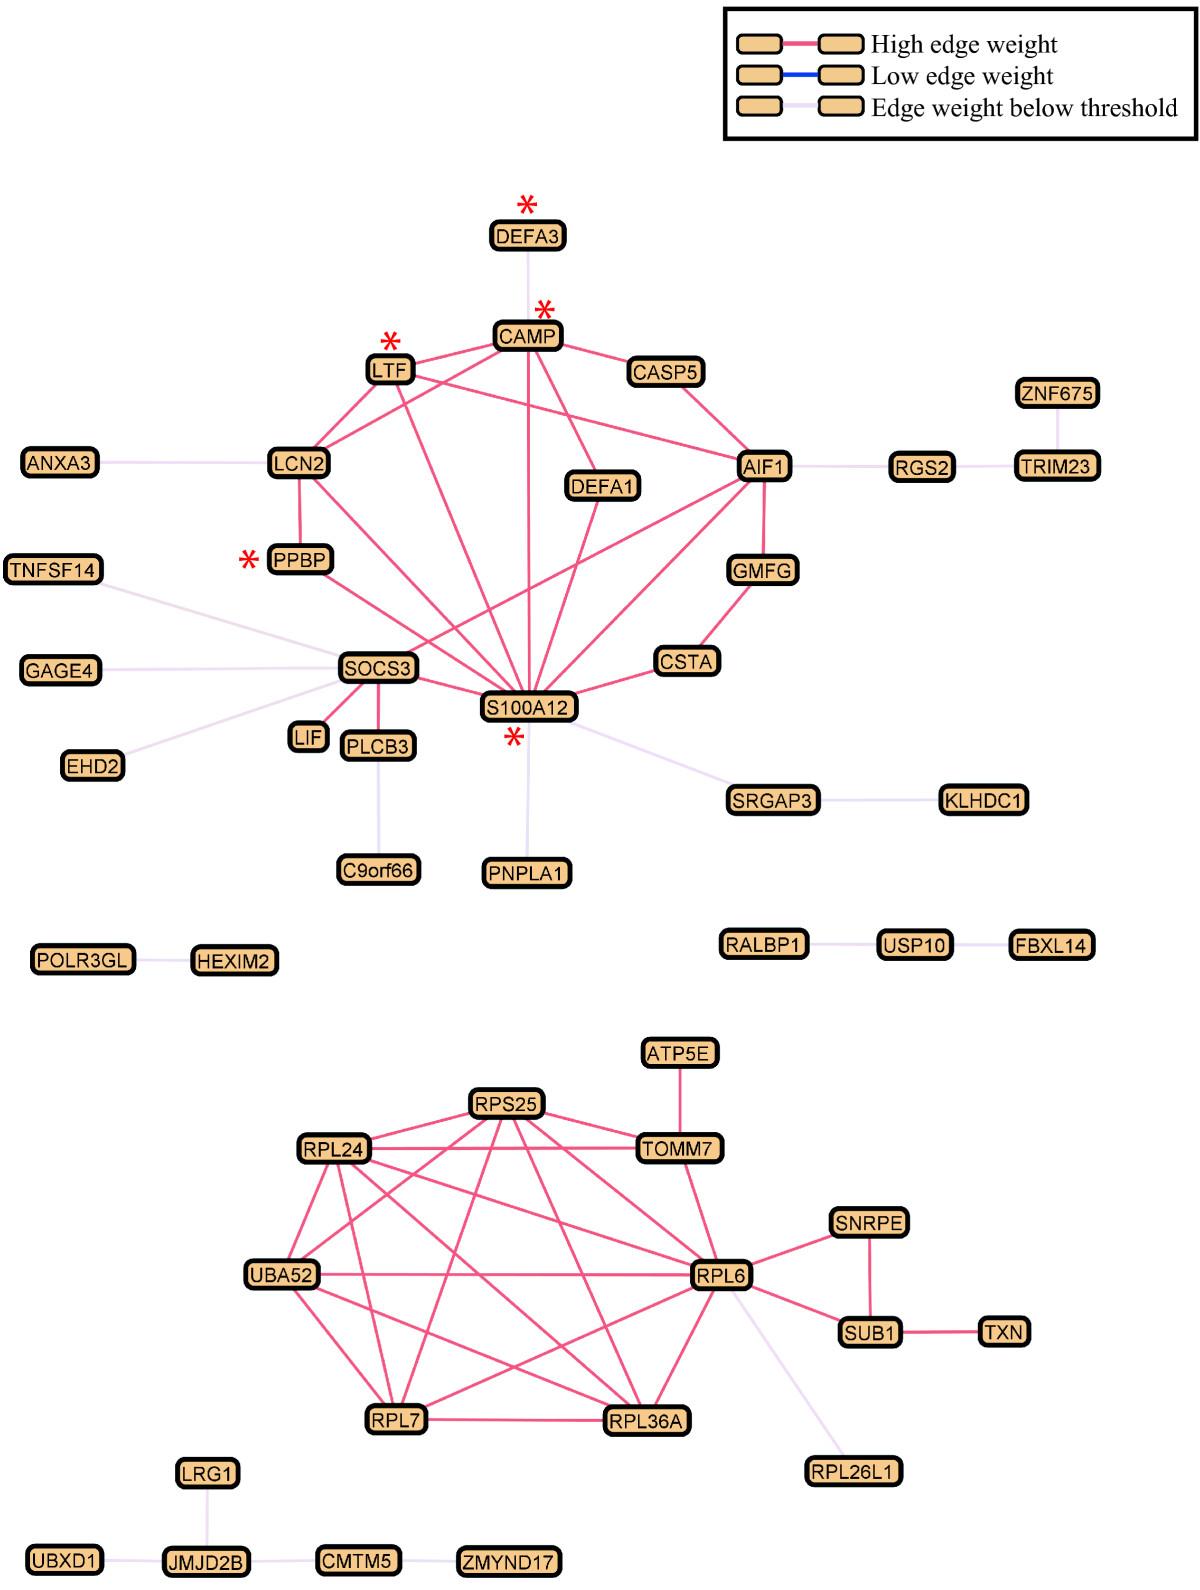 https://static-content.springer.com/image/art%3A10.1186%2Fbcr2472/MediaObjects/13058_2009_Article_2436_Fig2_HTML.jpg